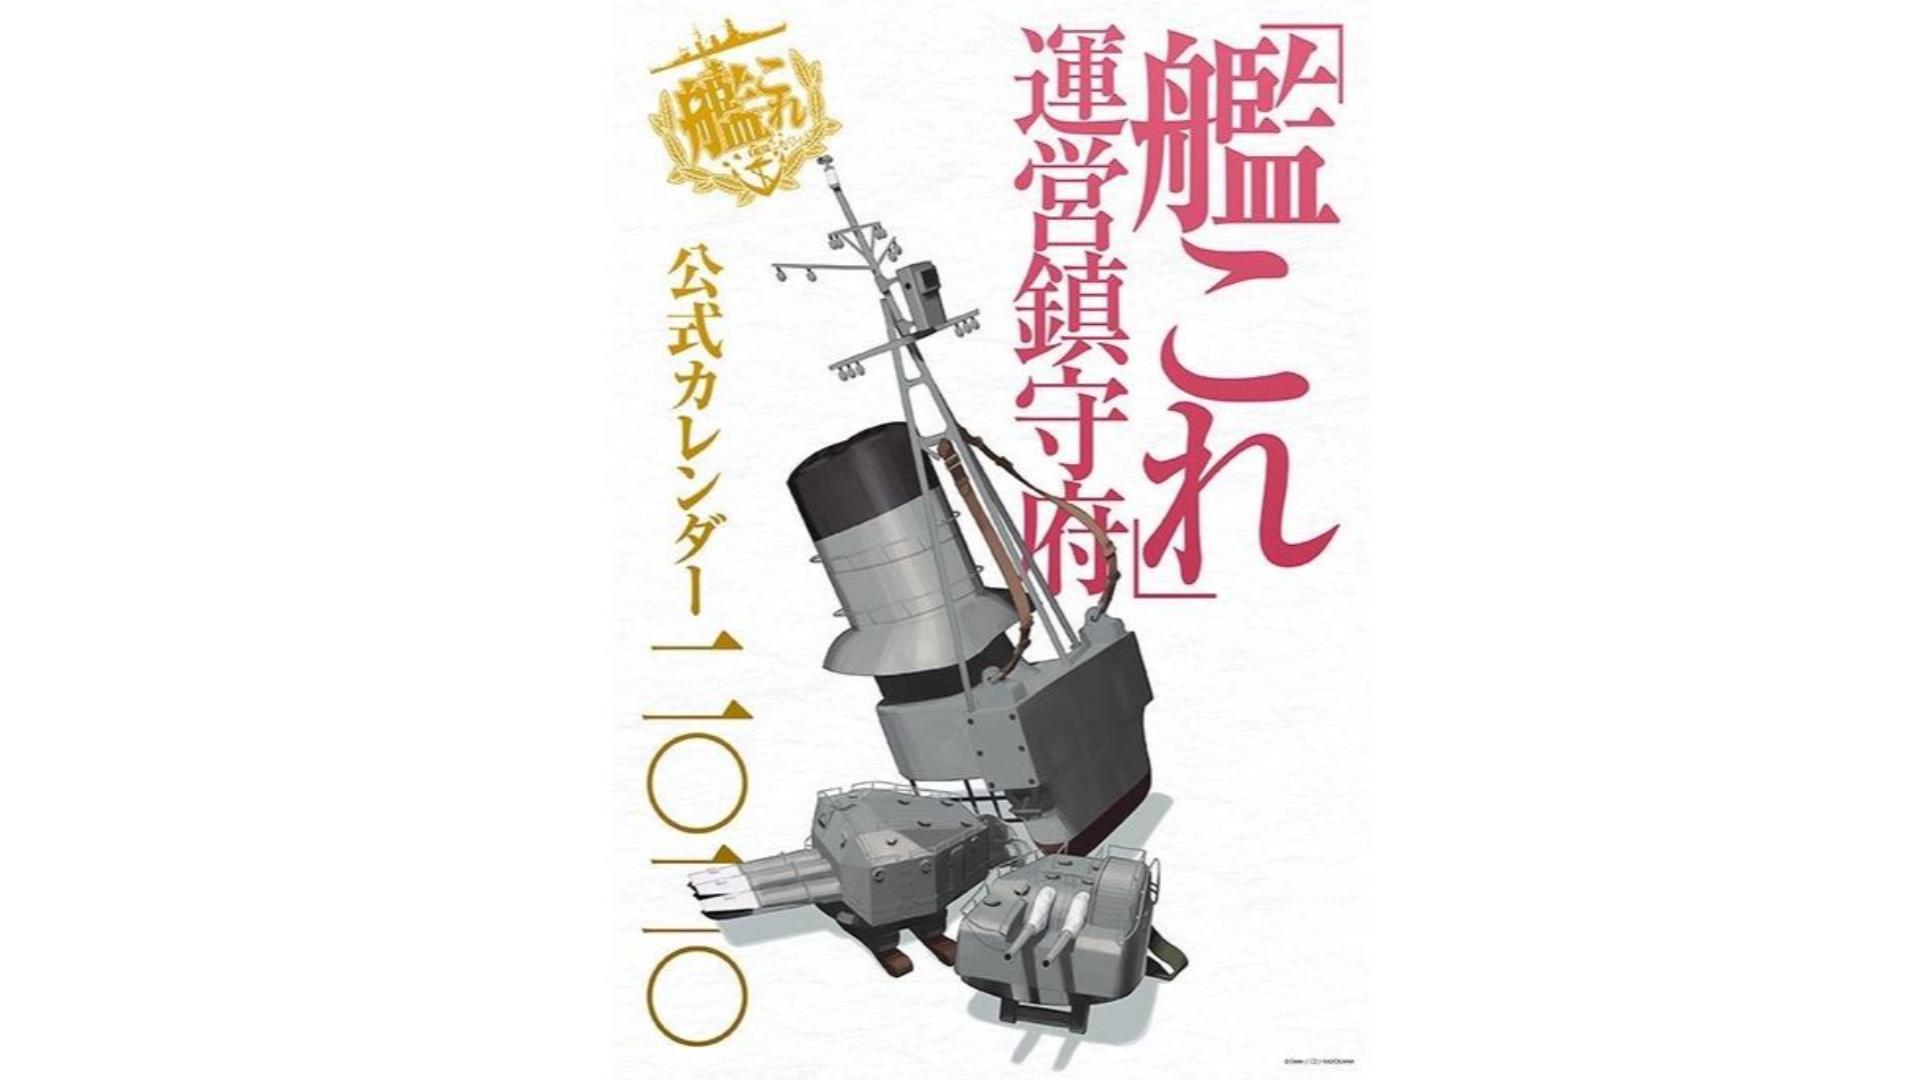 《舰队collection》公式挂历二〇二〇 12月27日发售 PV